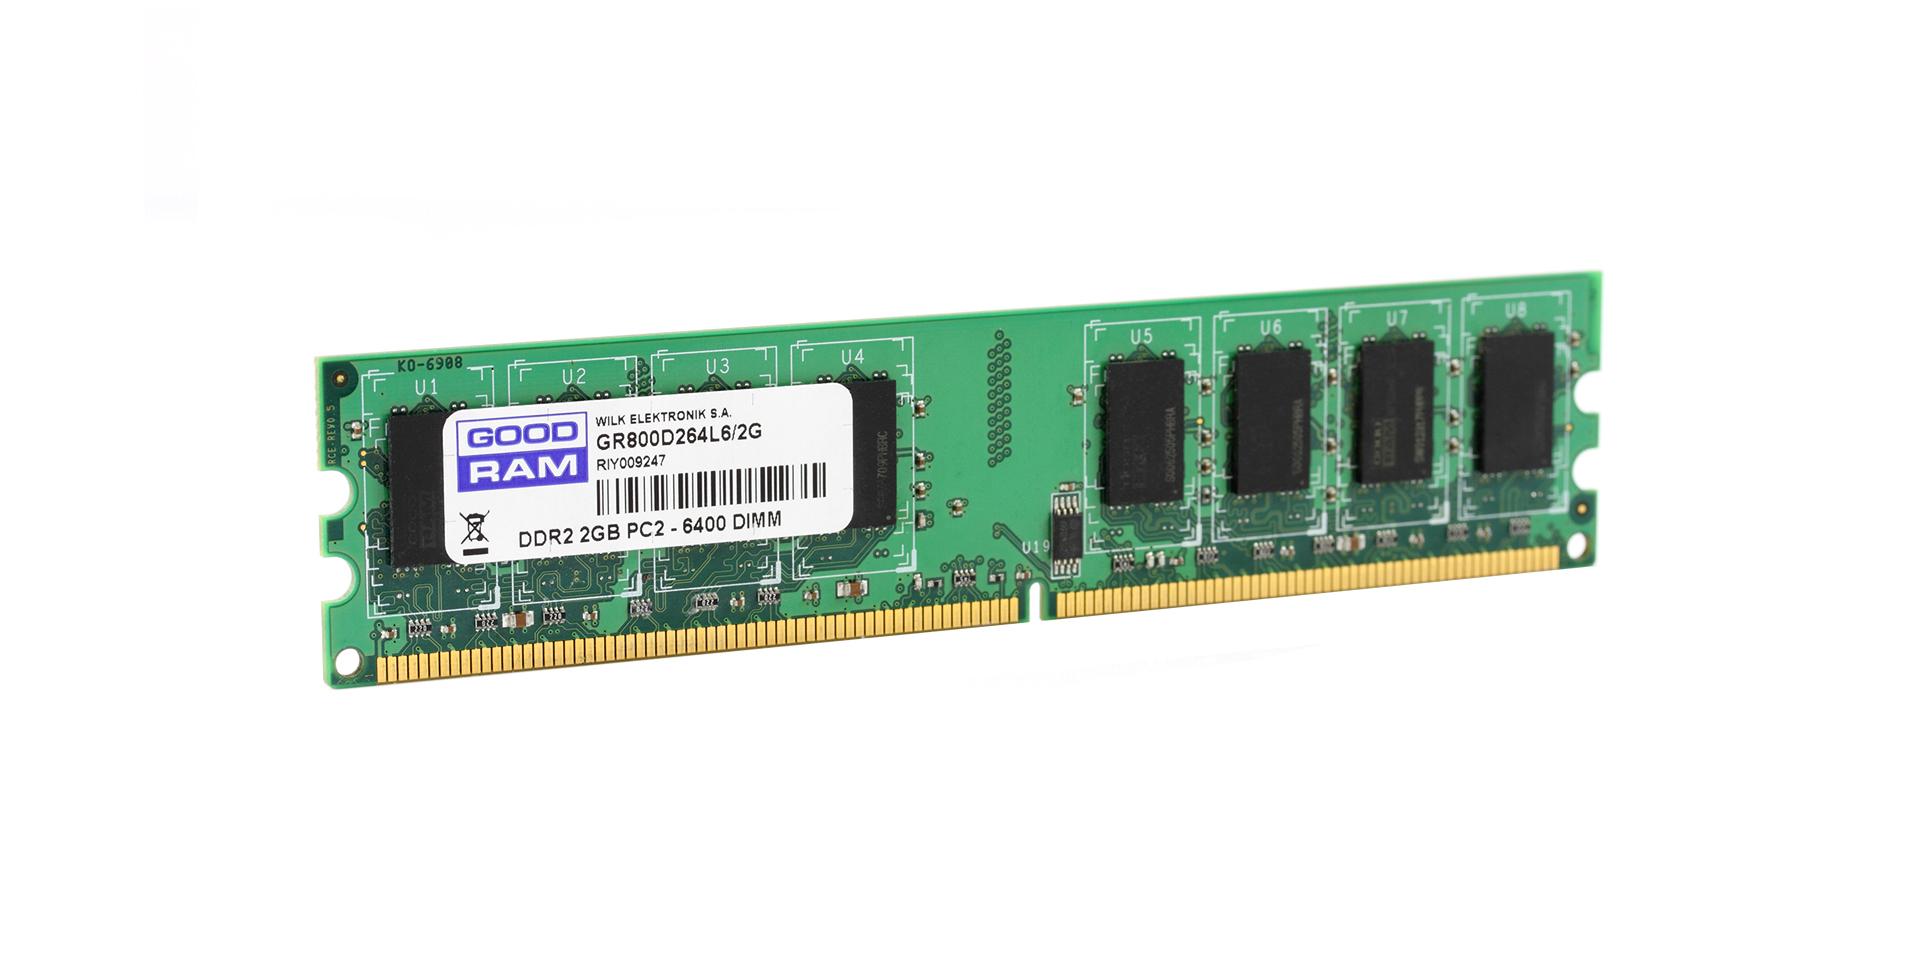 Ddr2 Dimm Dram Goodram 2gb Pet Memory Module